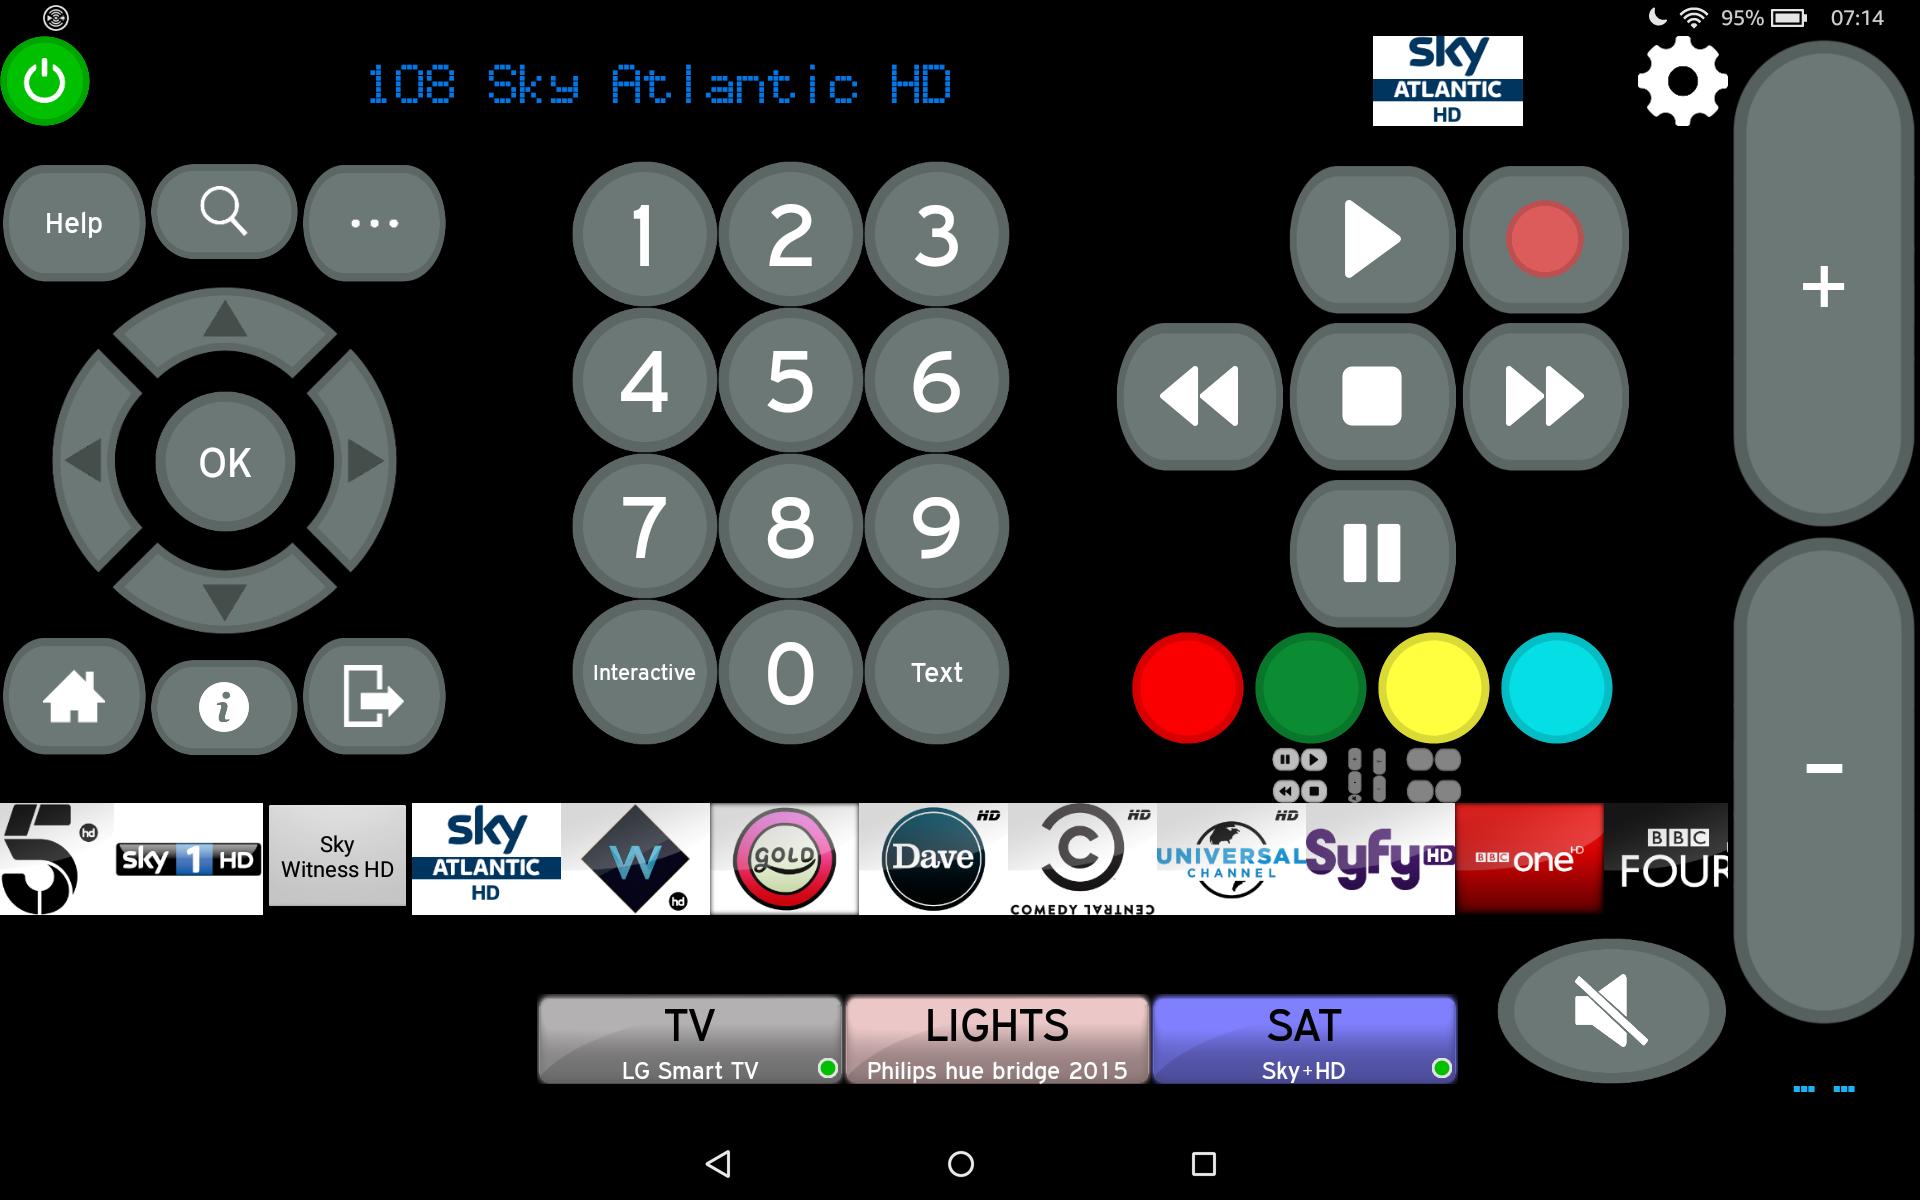 Answered: Use smartphone as a controller like skyhd - Sky